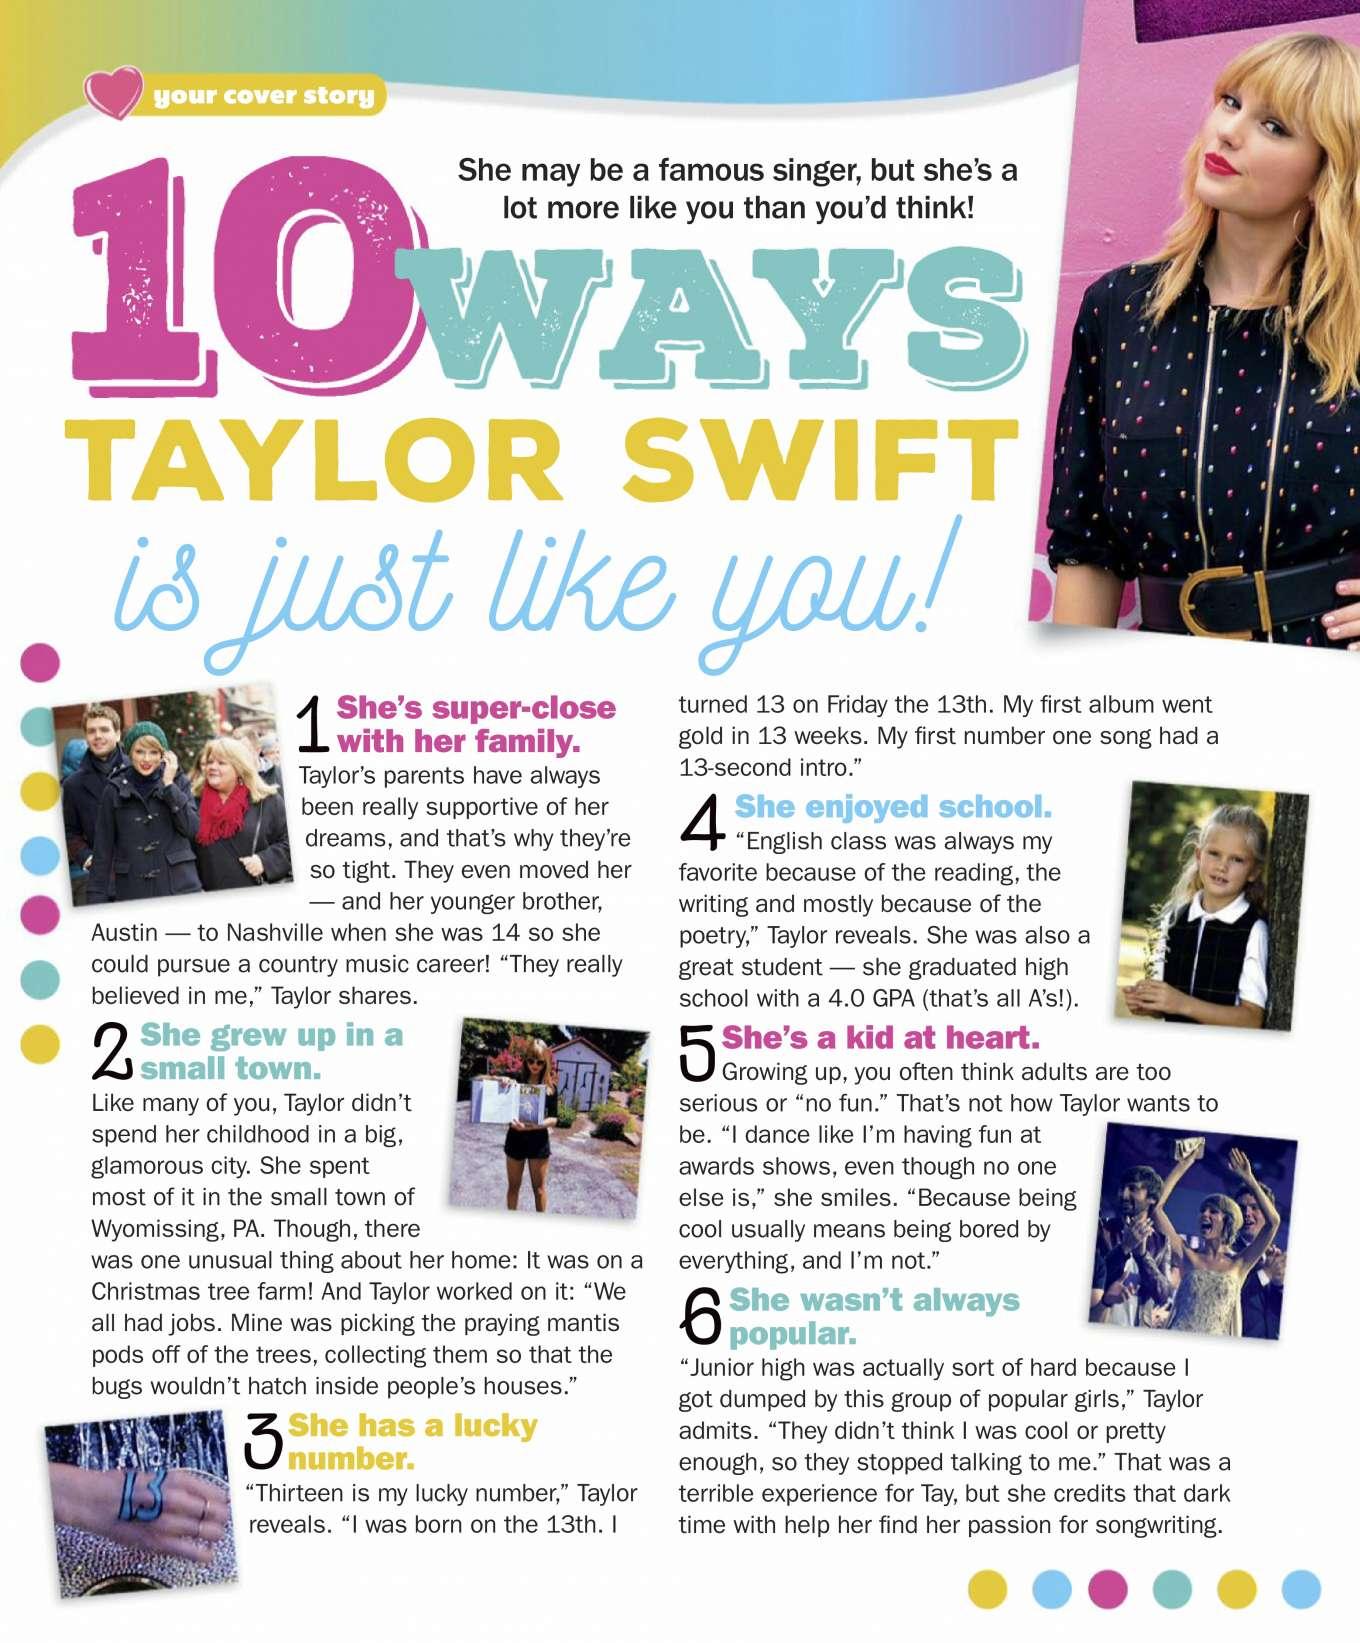 Taylor Swift 2019 : Taylor Swift – Girls World Magazine 2020-01